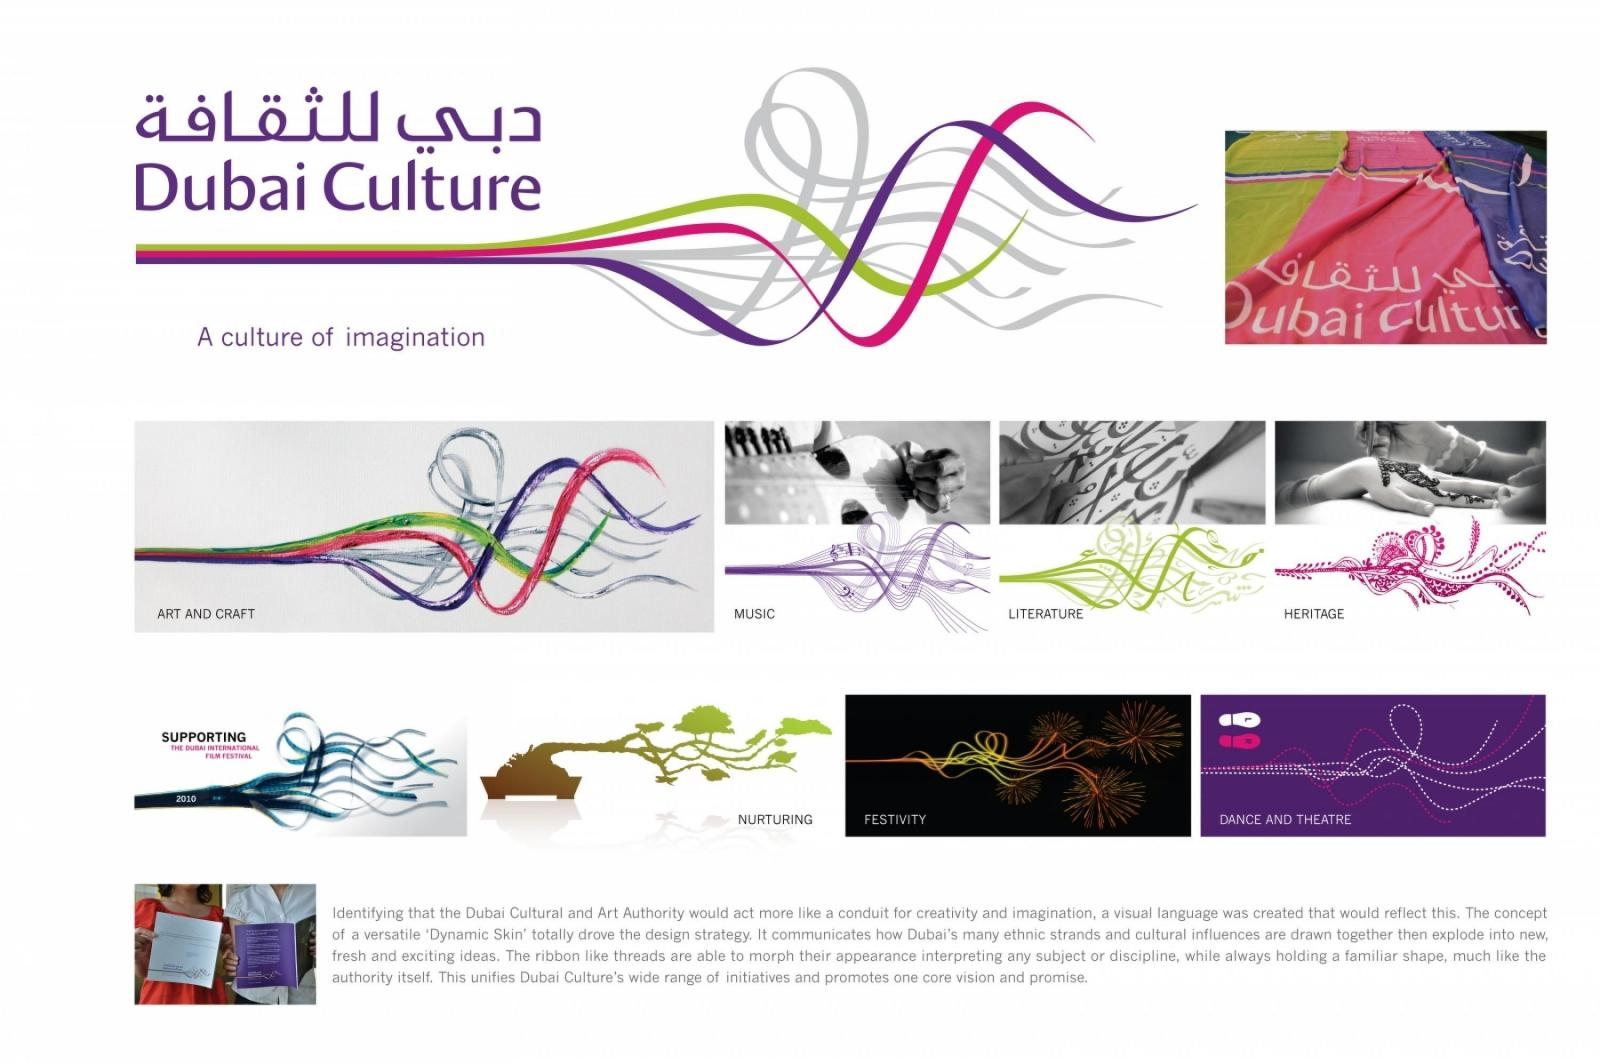 dubai-culture-and-art-authority-dubai-culture-1600-98227